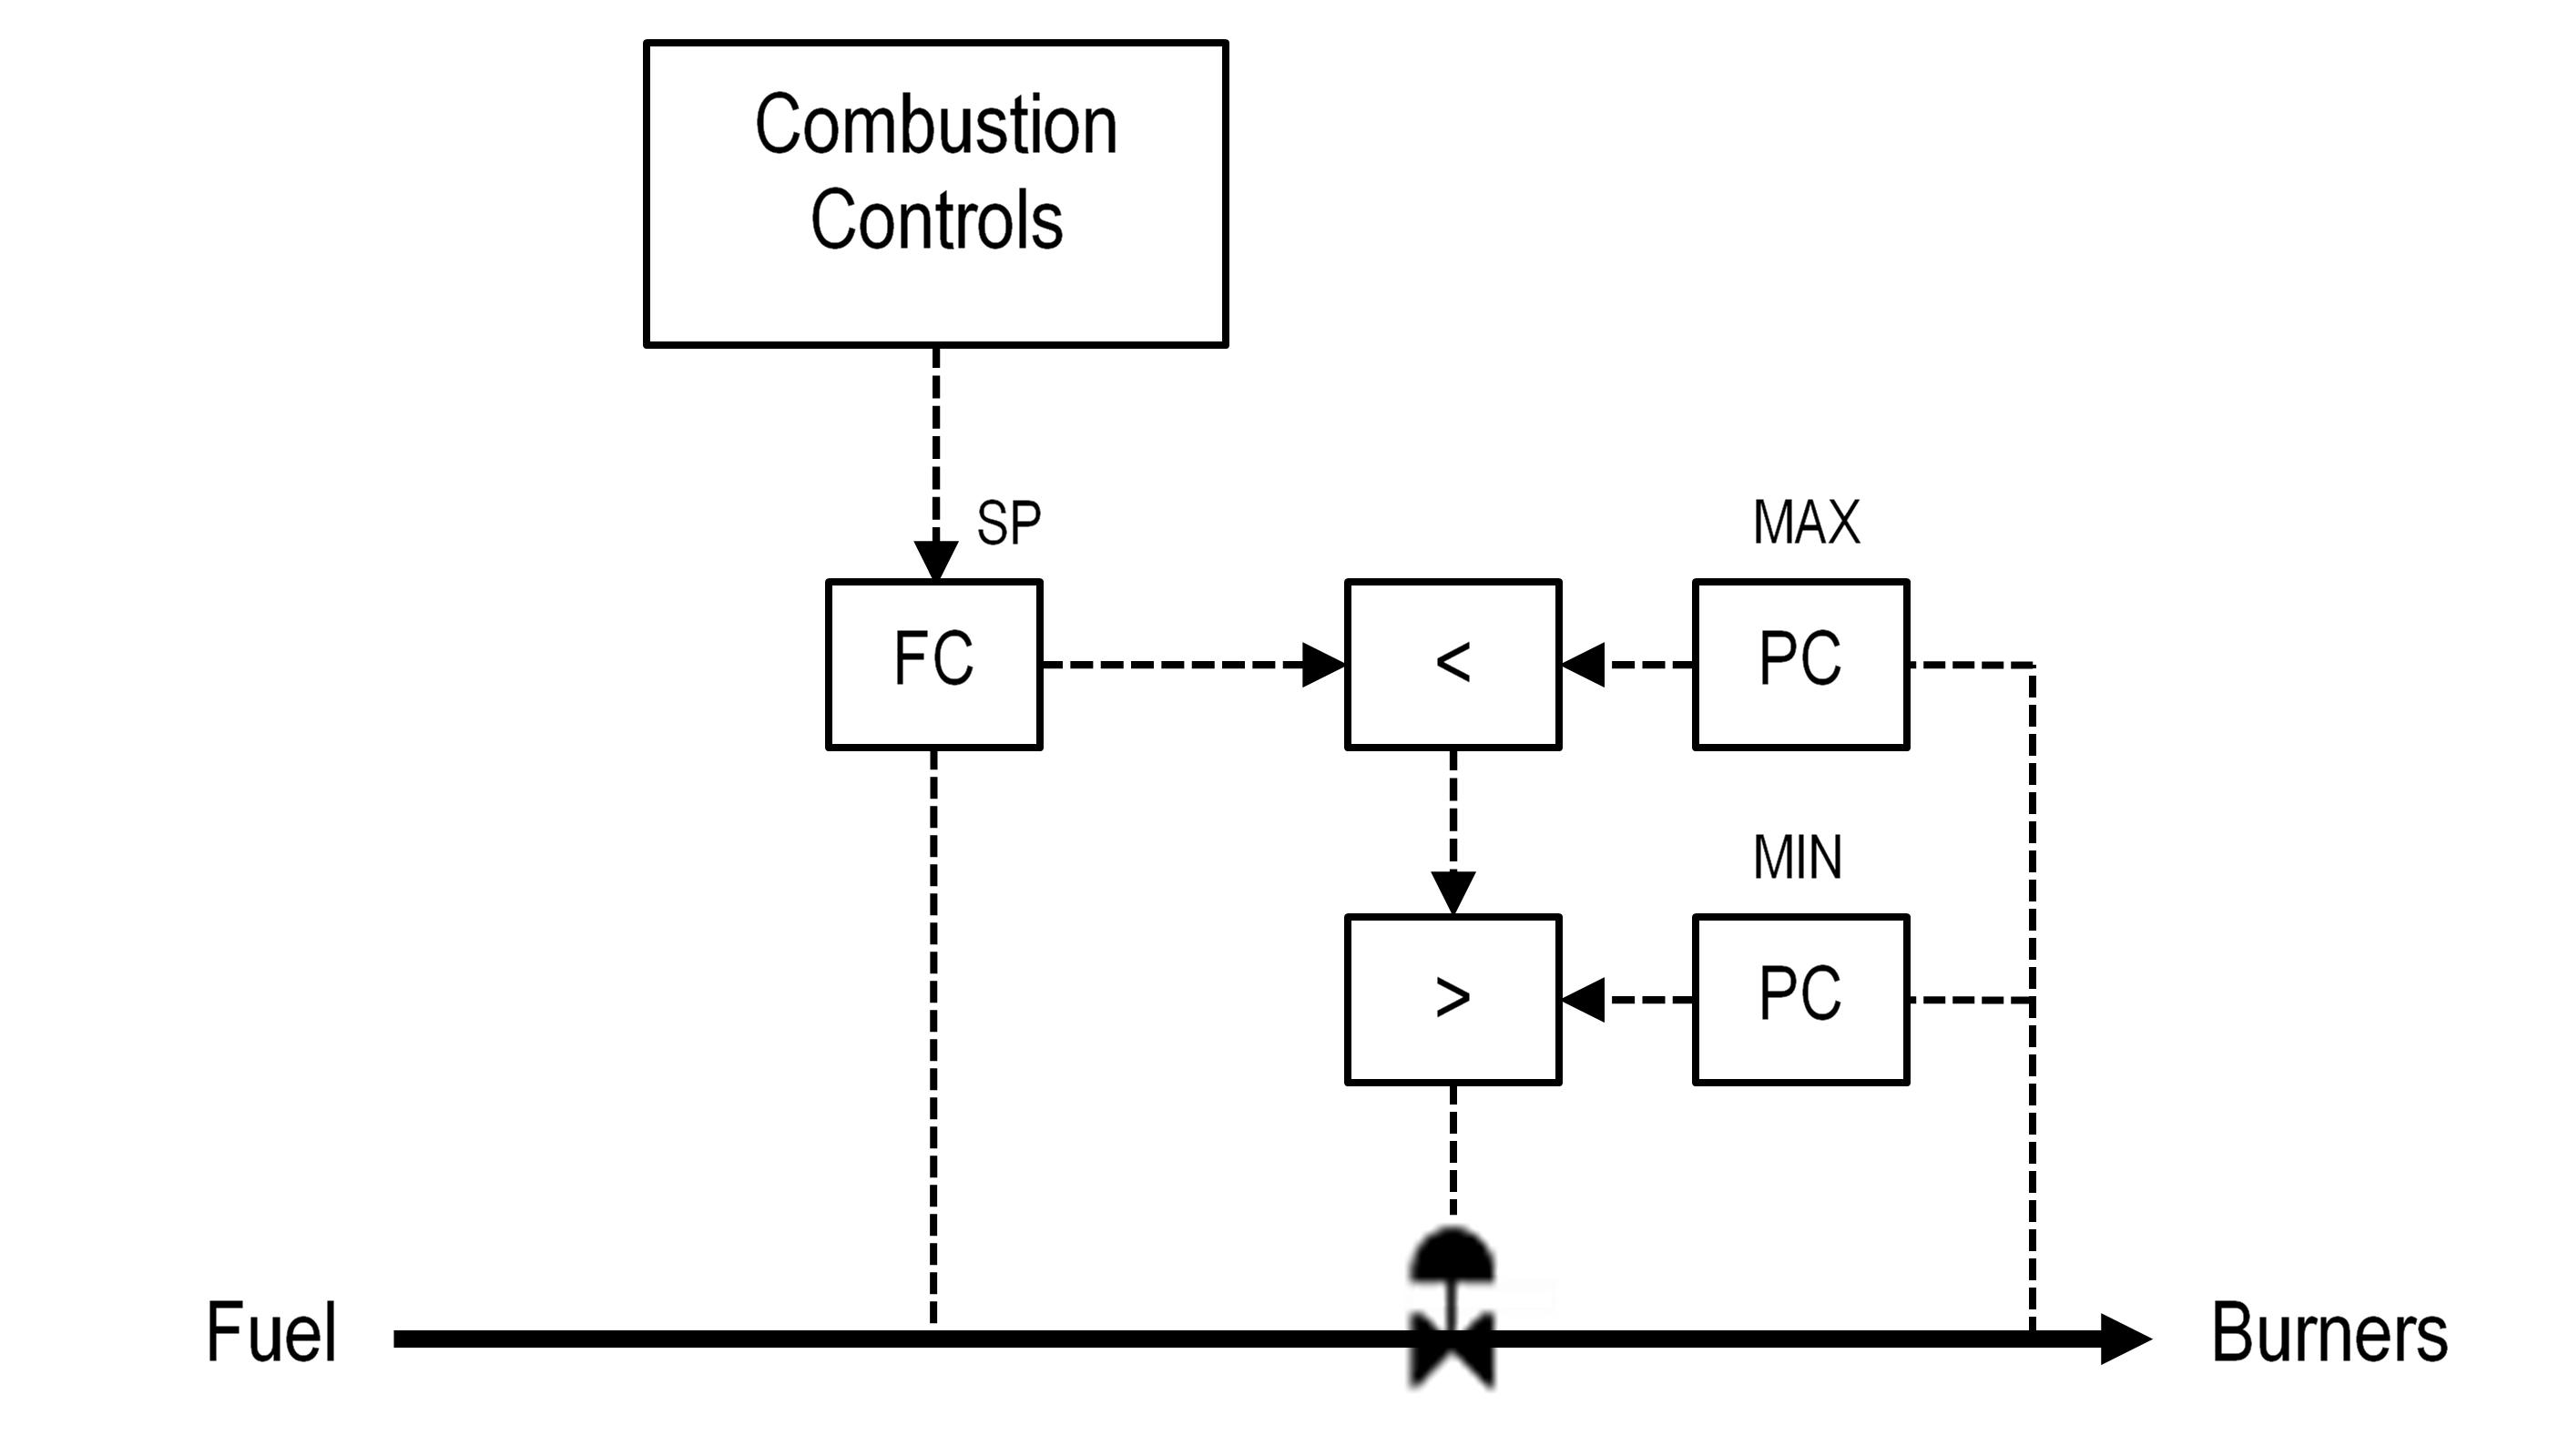 Figure 9 Burner Pressure Overrides